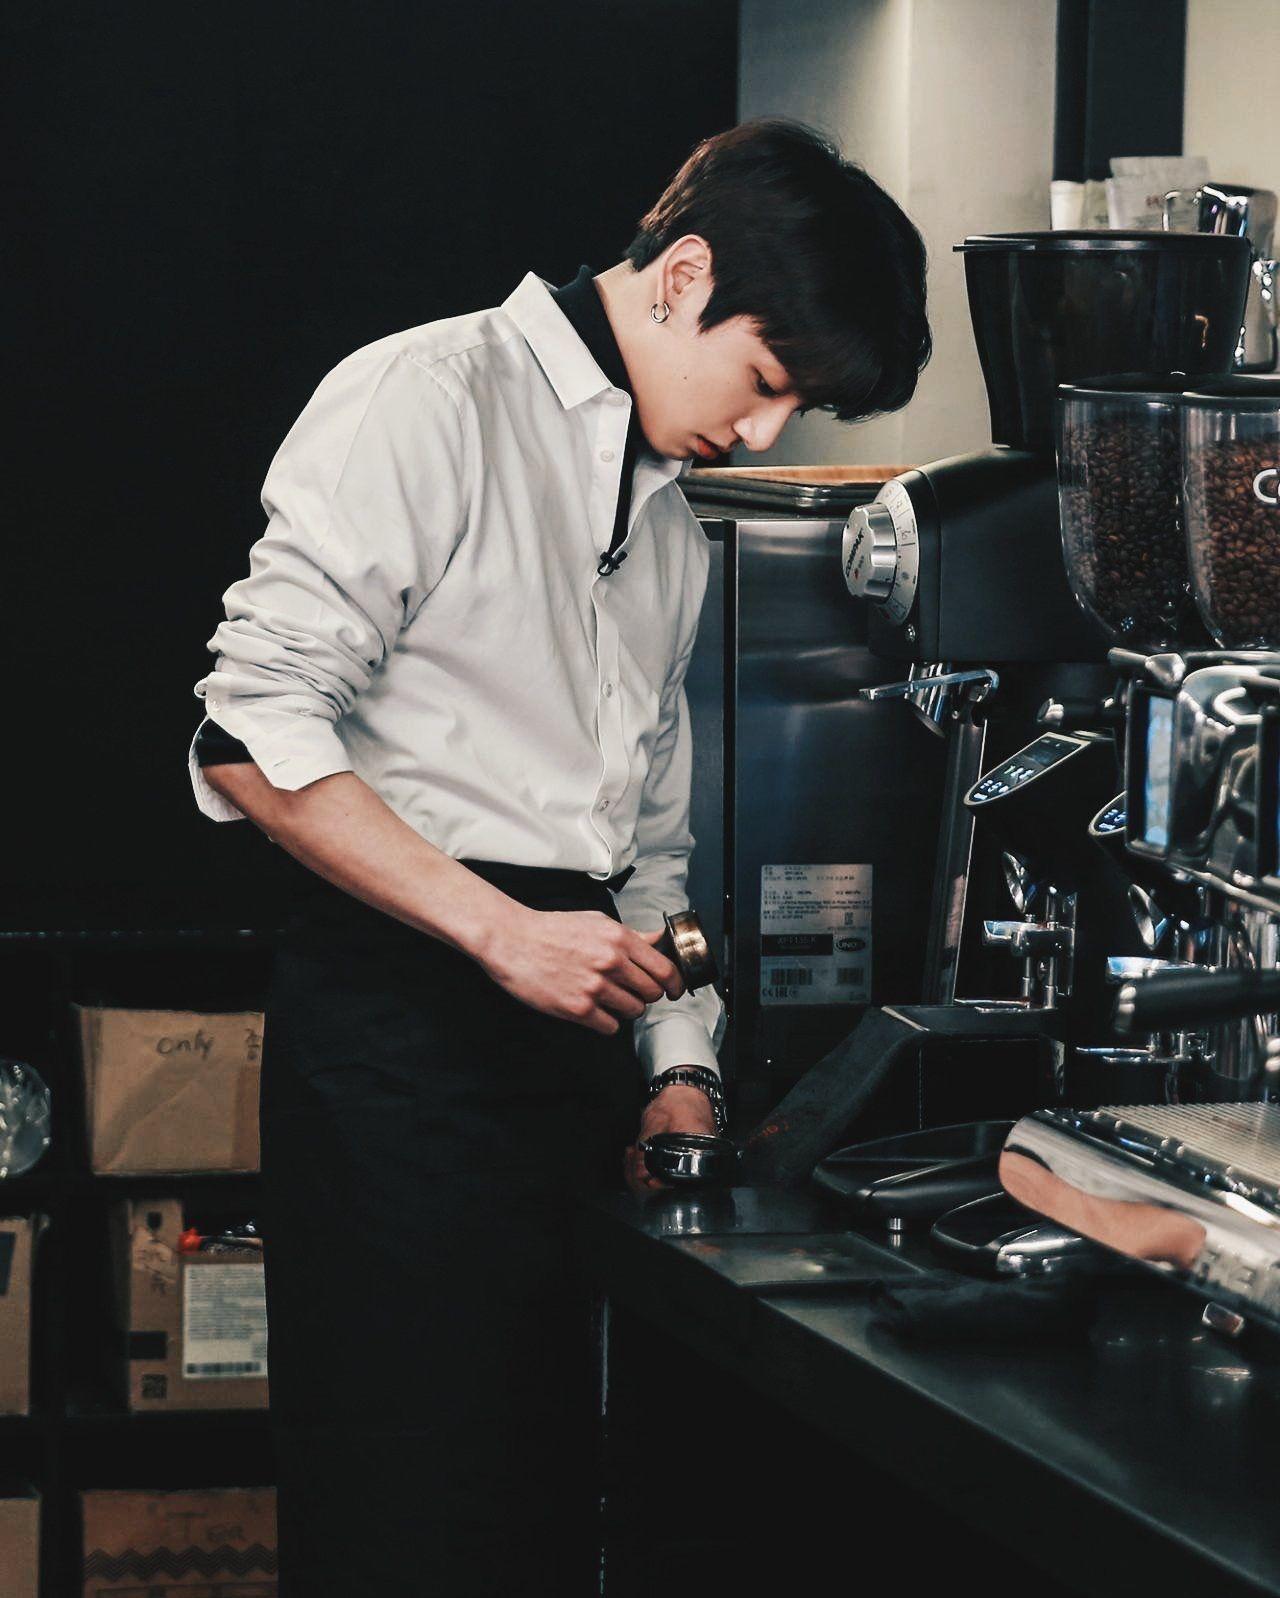 I M Going To Start Watching My Caffeine Intake Because Baby You